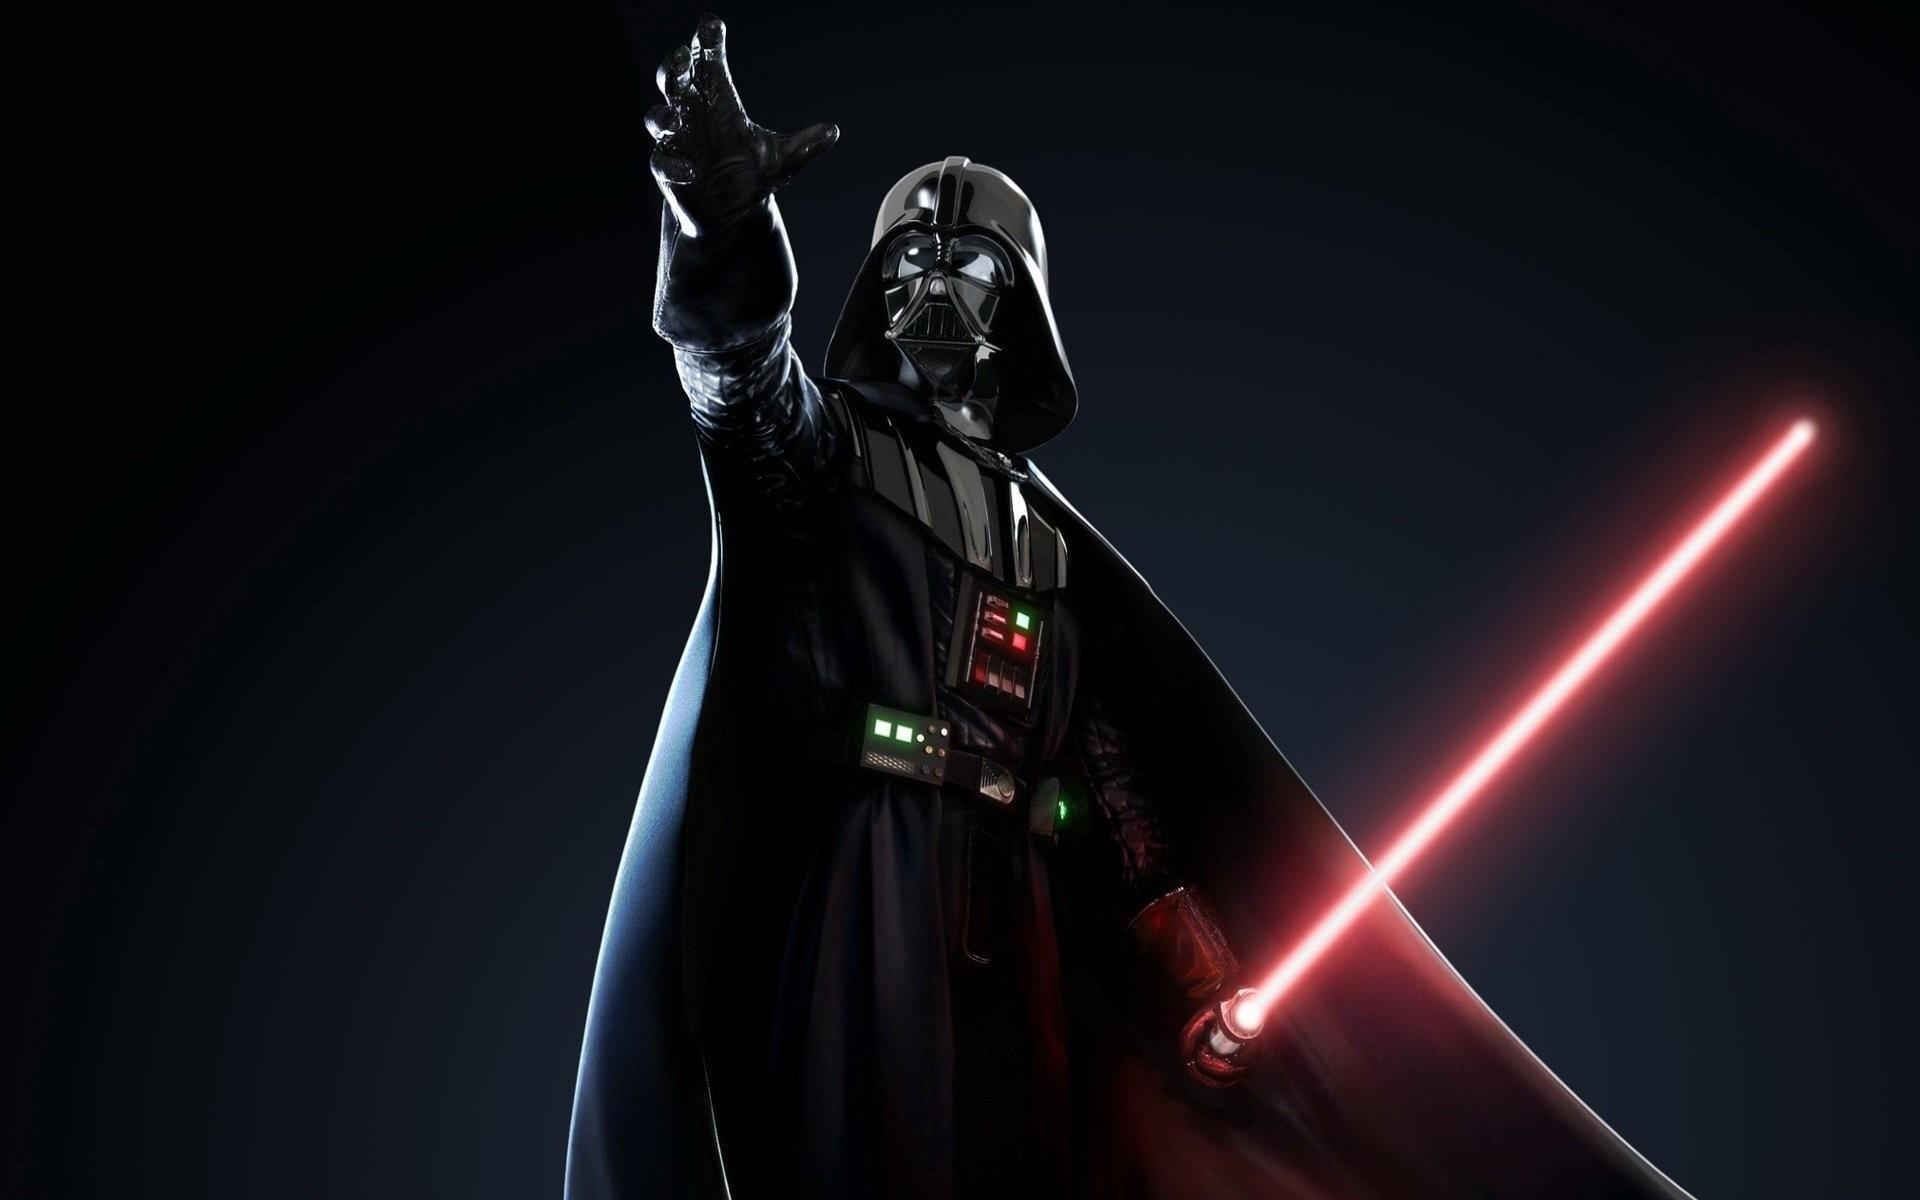 Star Wars Darth Vader Wallpaper Wallpapertag